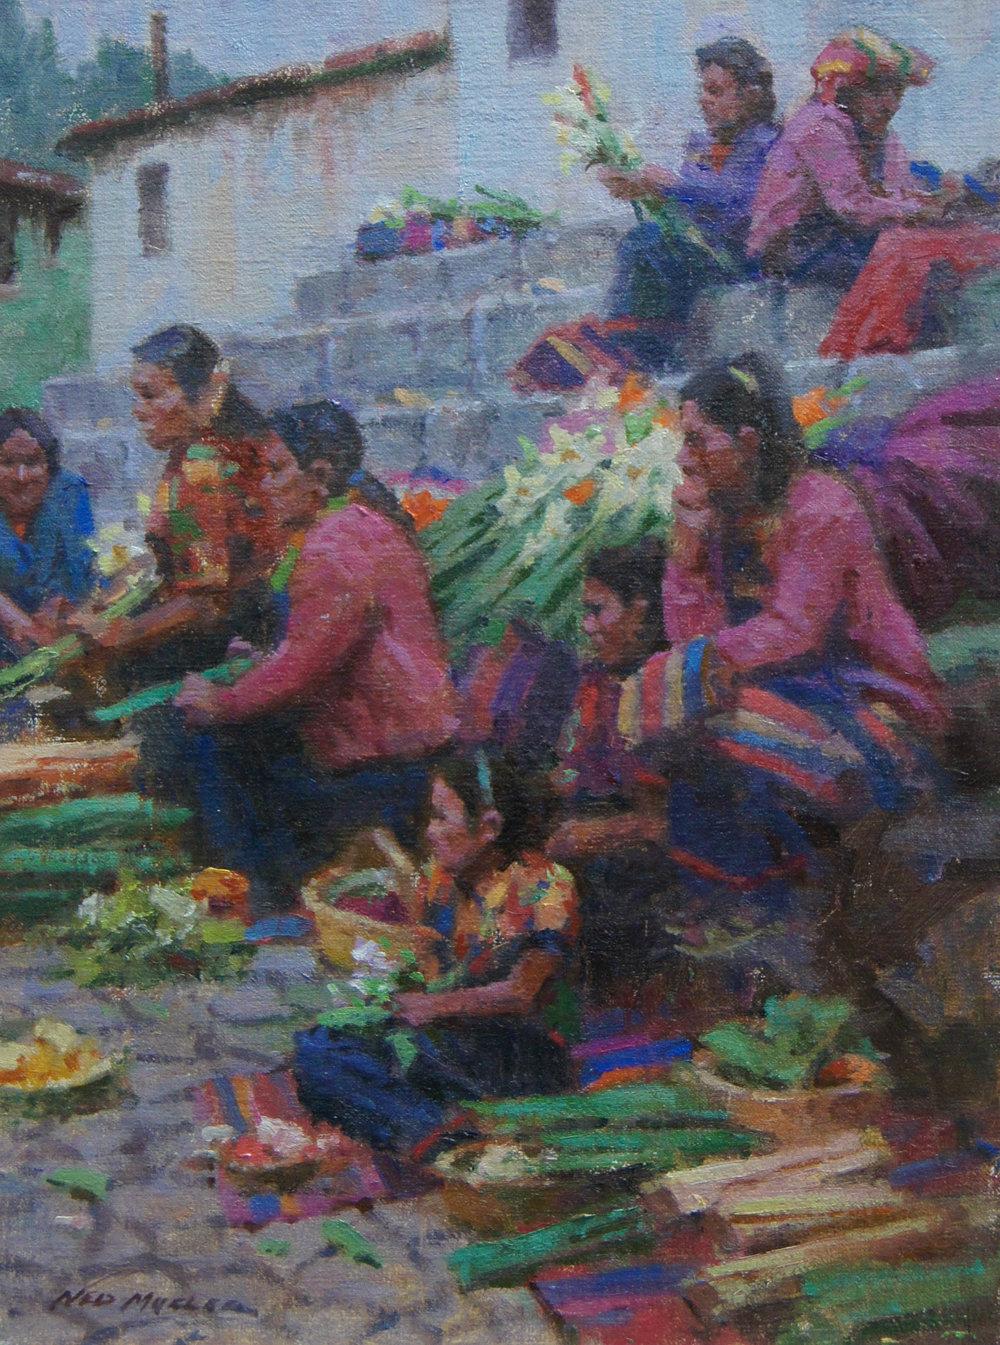 Ned Mueller, Morning Market-Guatemala